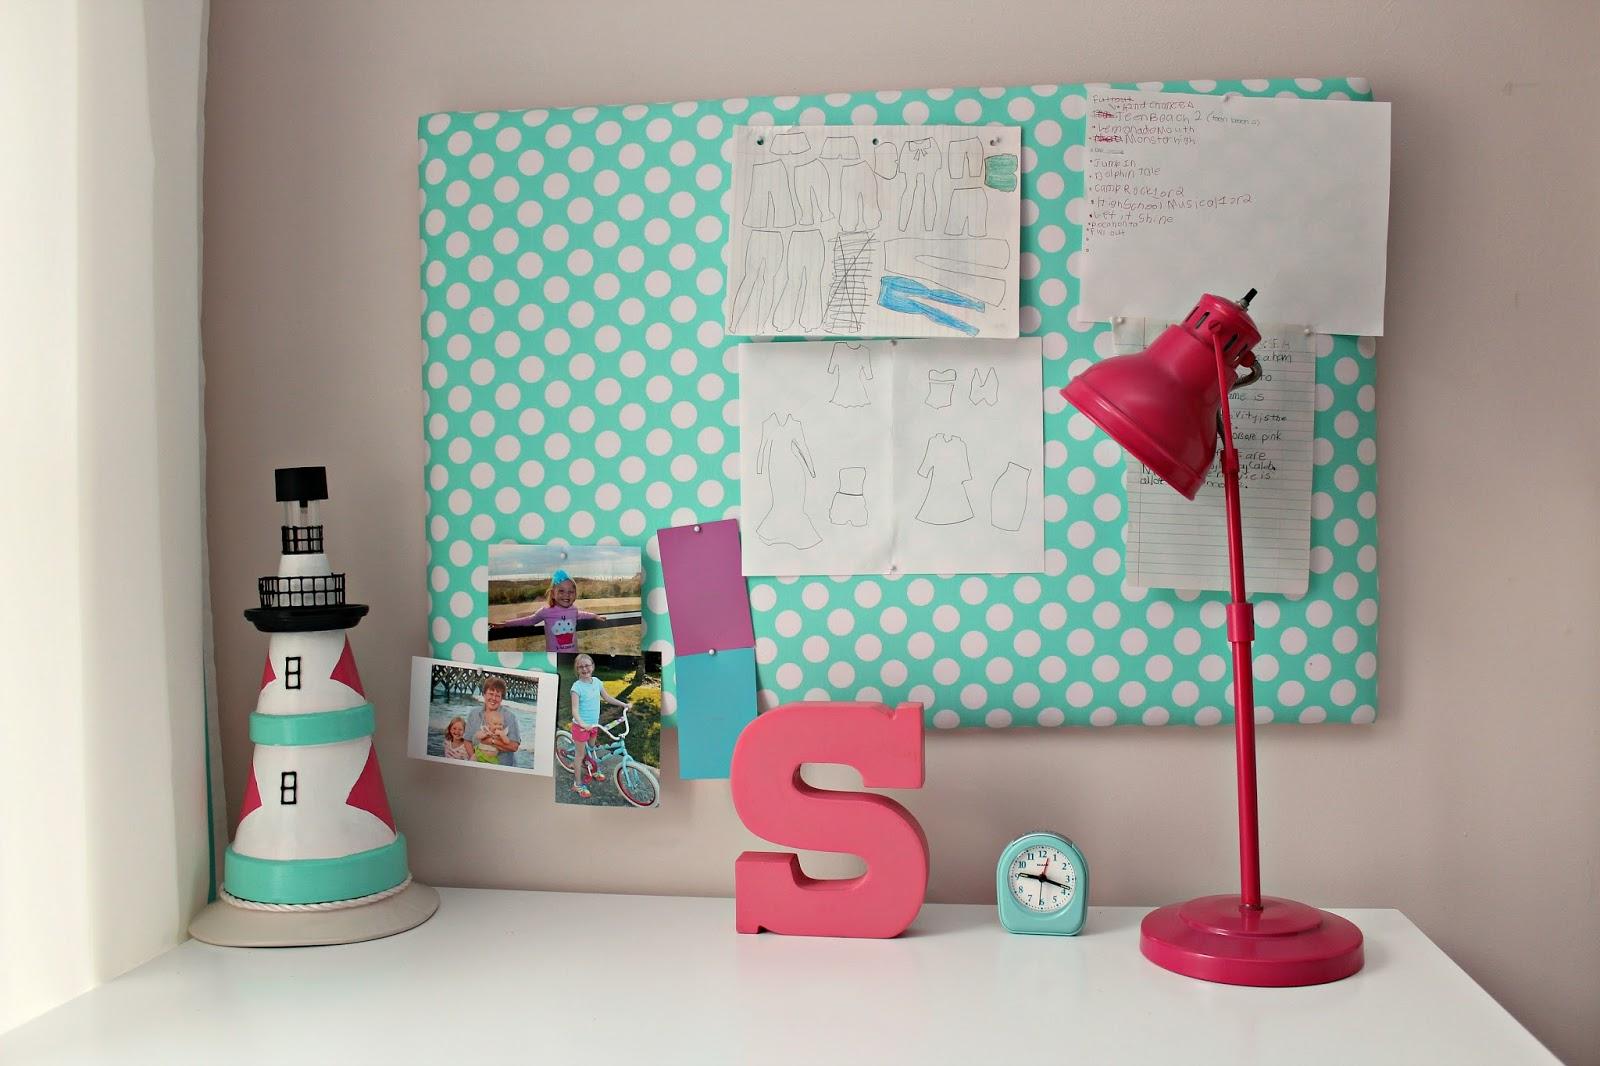 office chair jtf desk home depot carolina on my mind savannah 39s bedroom mini makeover reveal